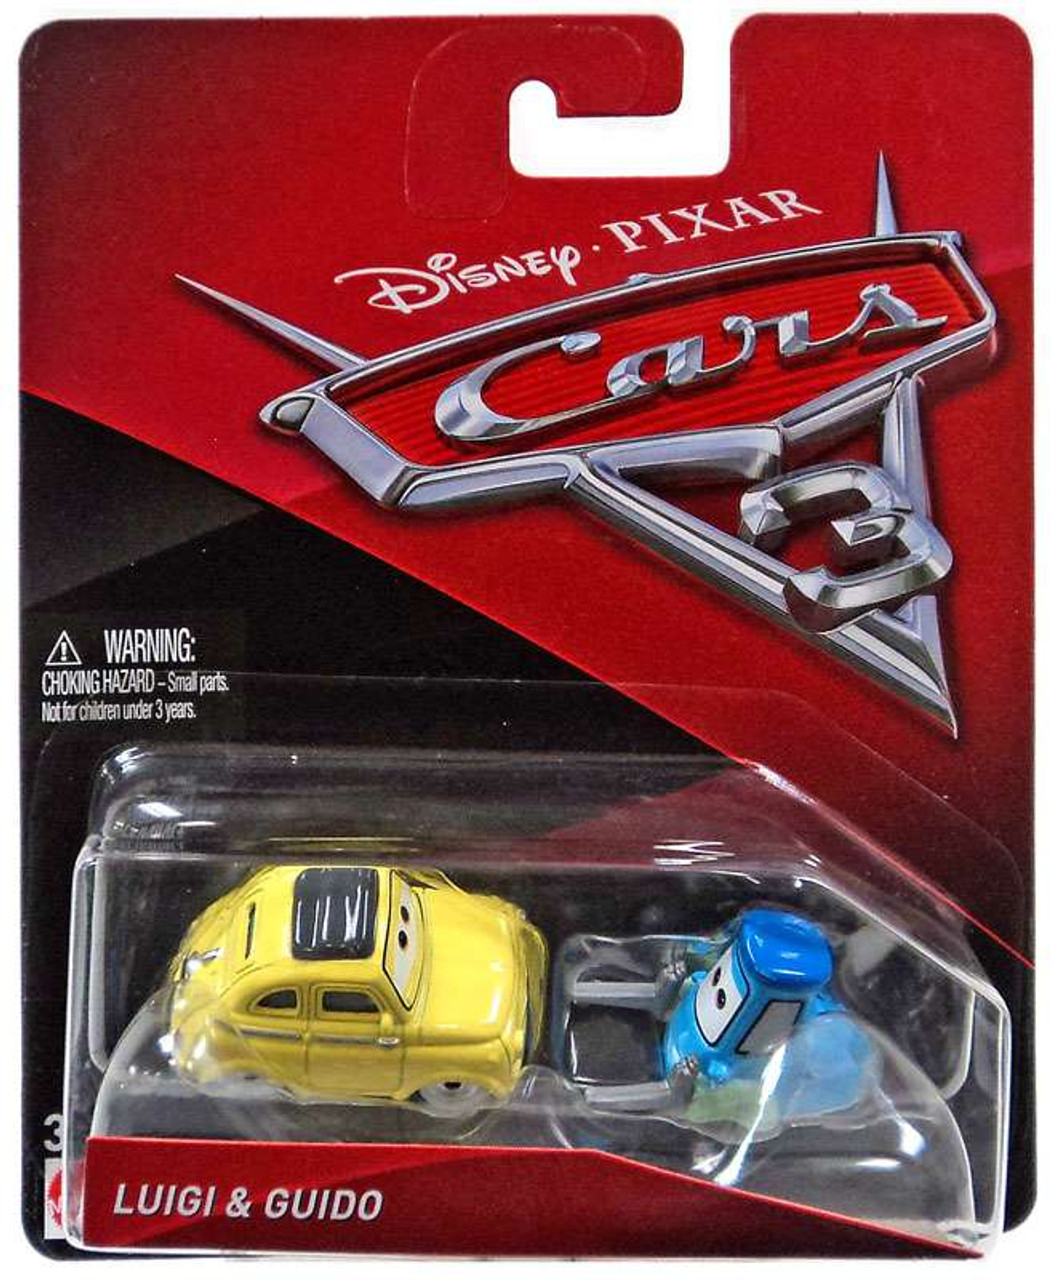 Disney Pixar Cars Cars 3 Luigi Guido 155 Diecast Car 2 Pack Mattel